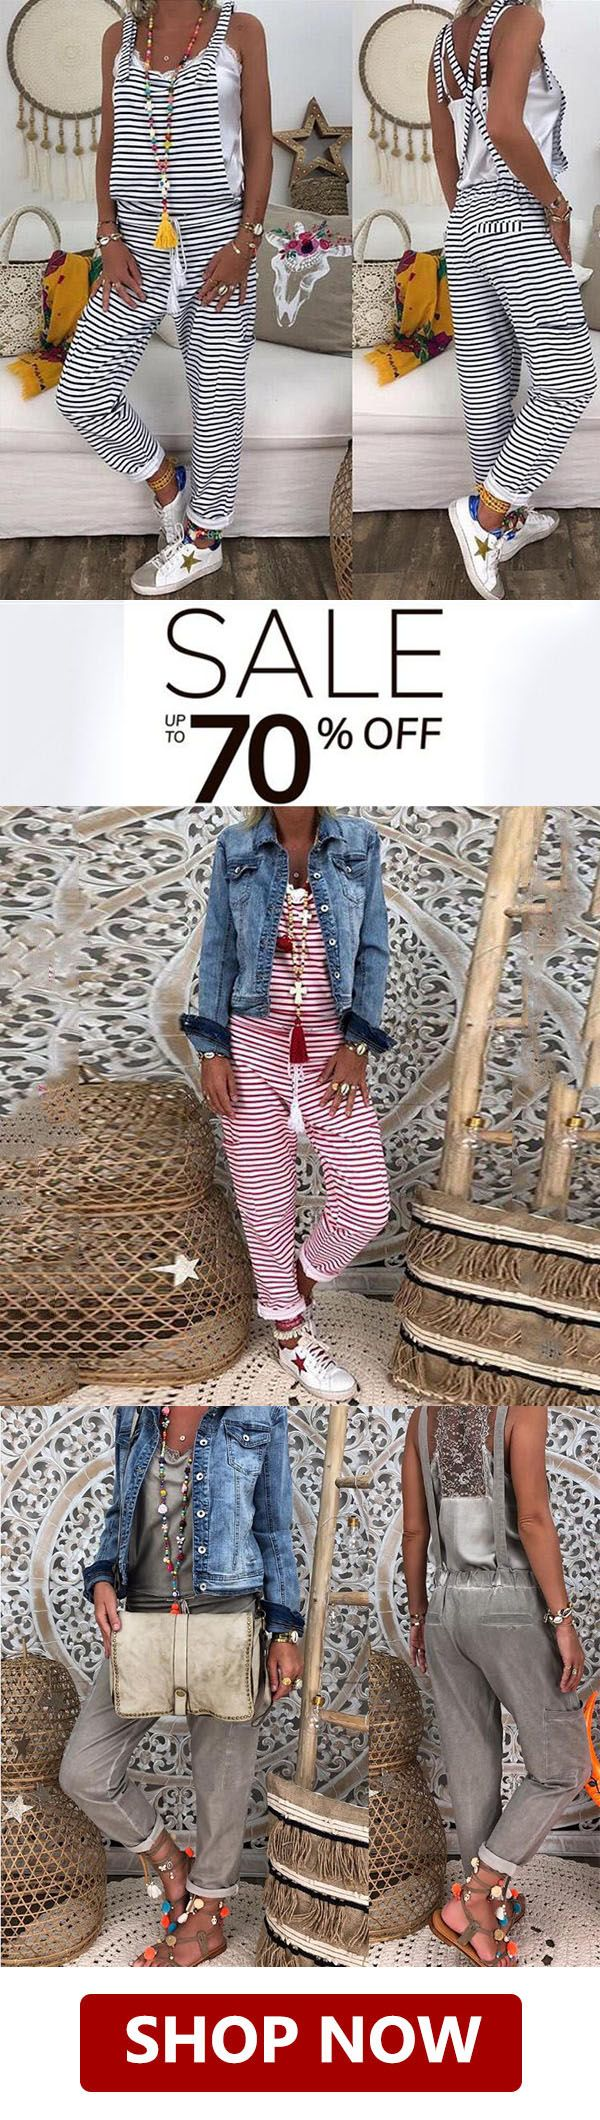 Women Fashion Casual Hot Sale Jumpsuits